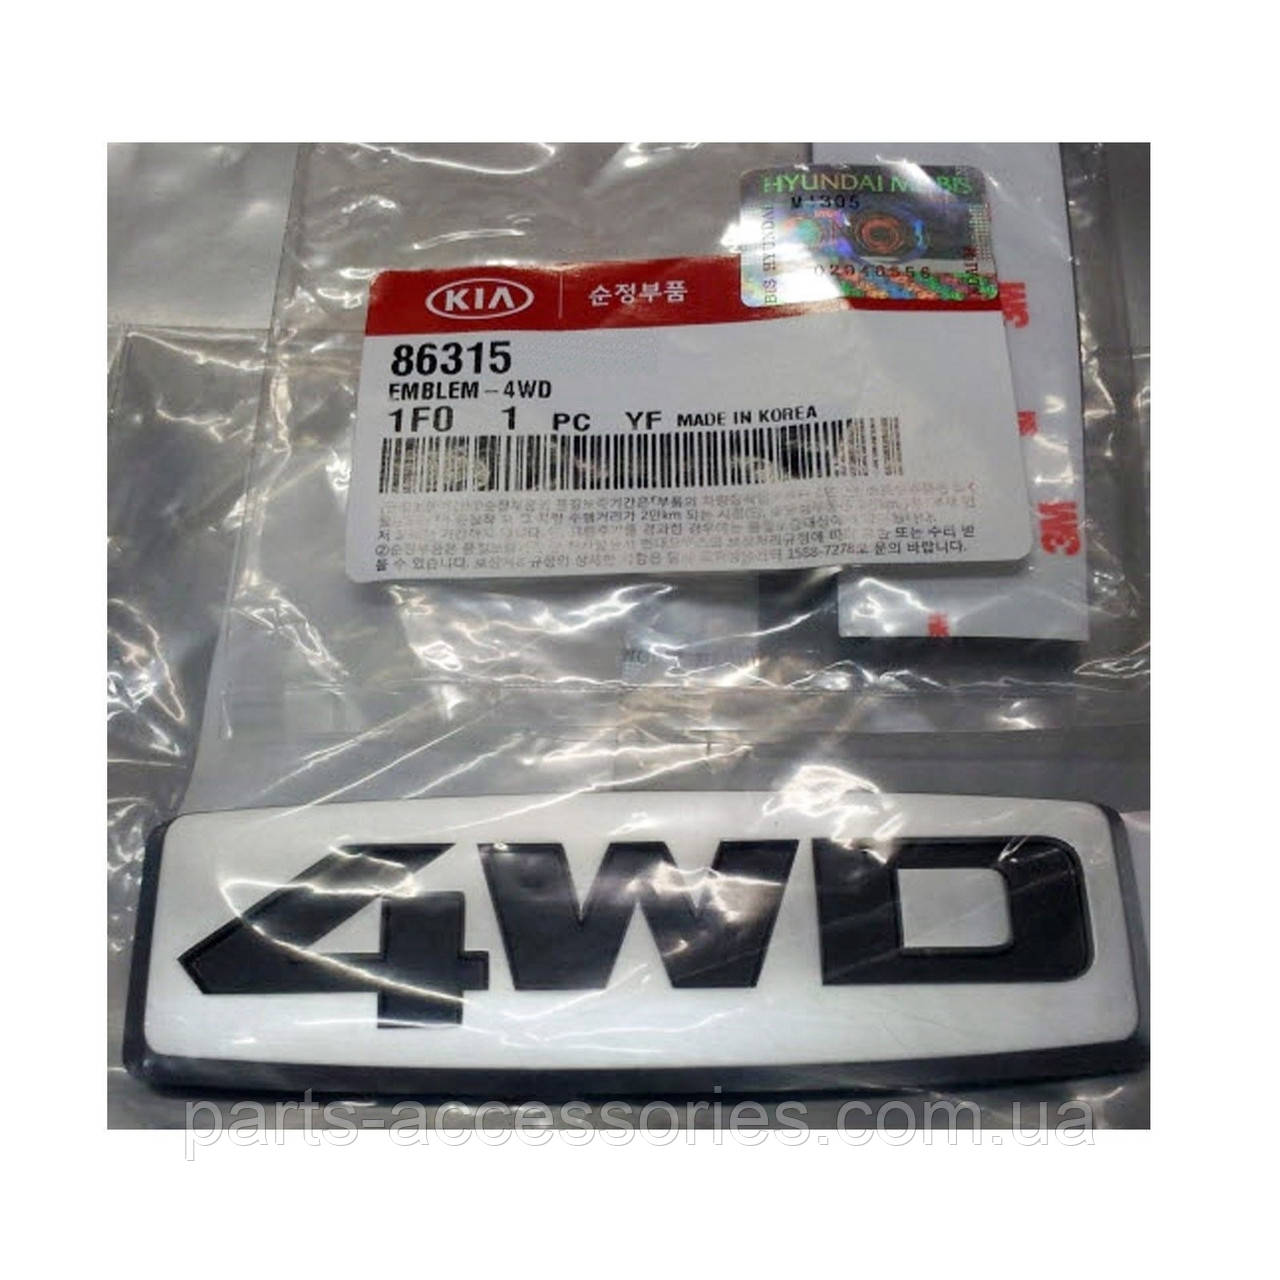 Kia Sportage 2004-09 эмблема значок 4WD новый оригинал